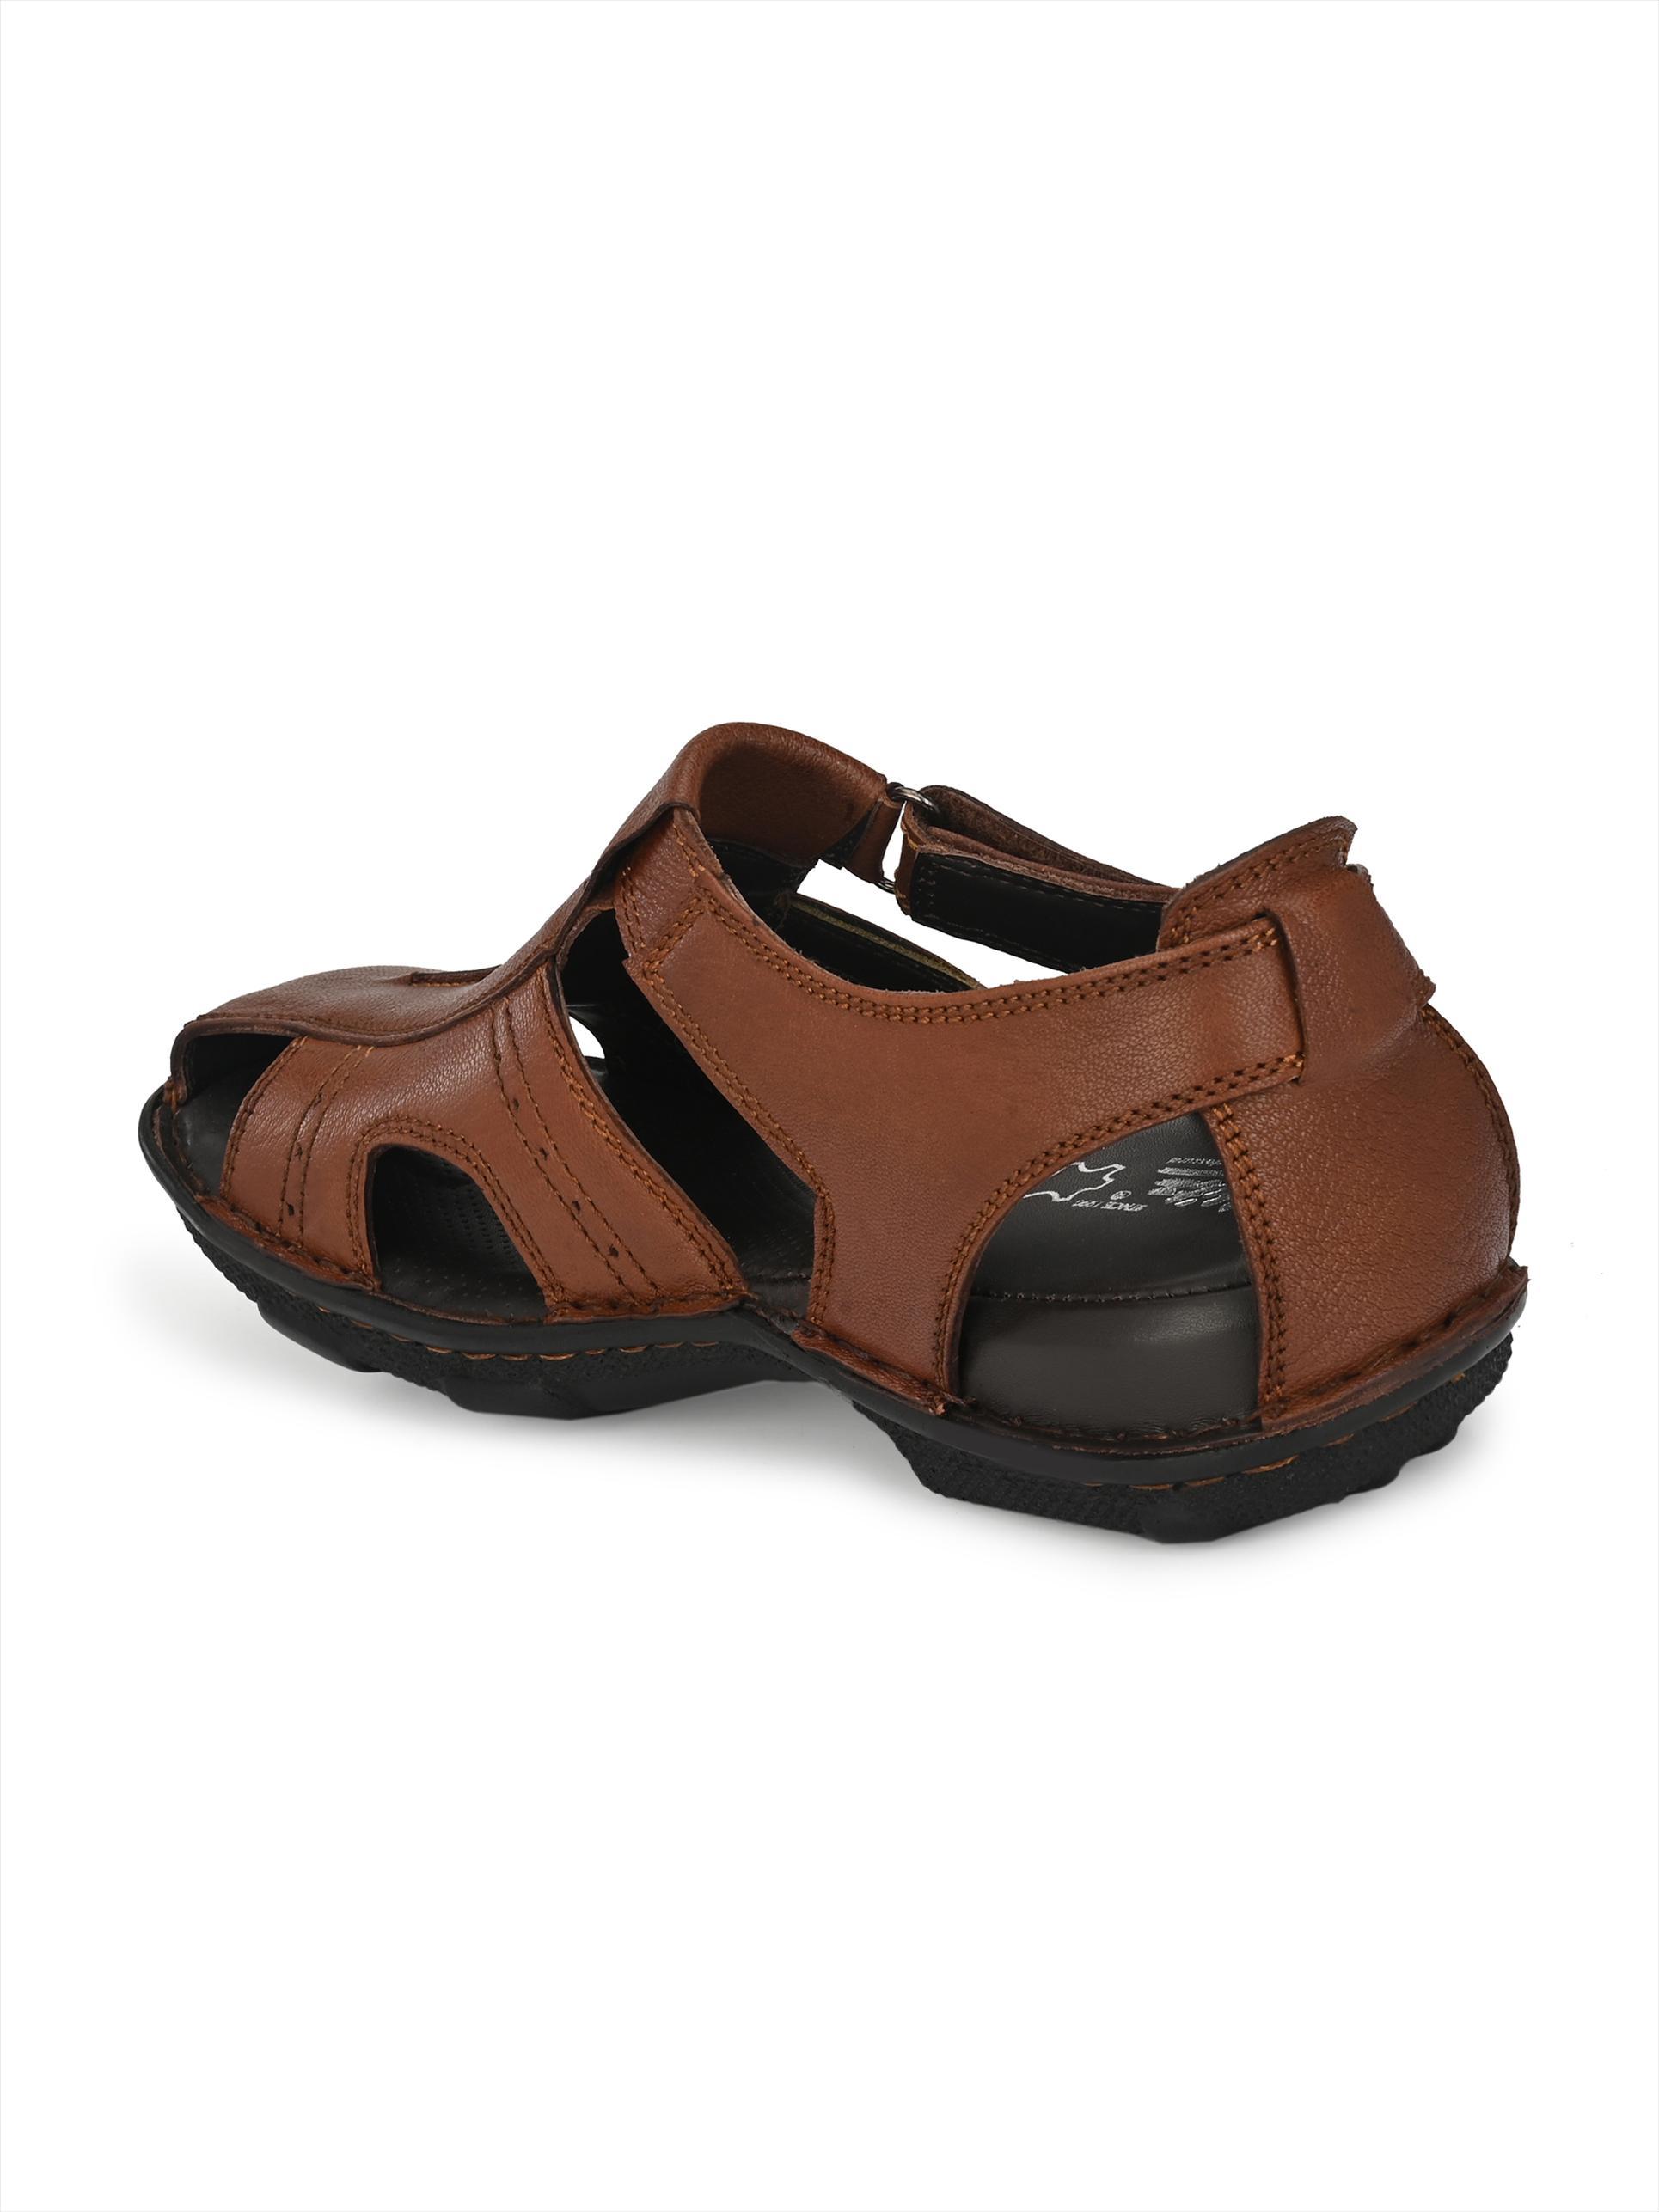 Hitz | Hitz Brown Genuine Leather Office Wear Sandal with Velcro Fastening